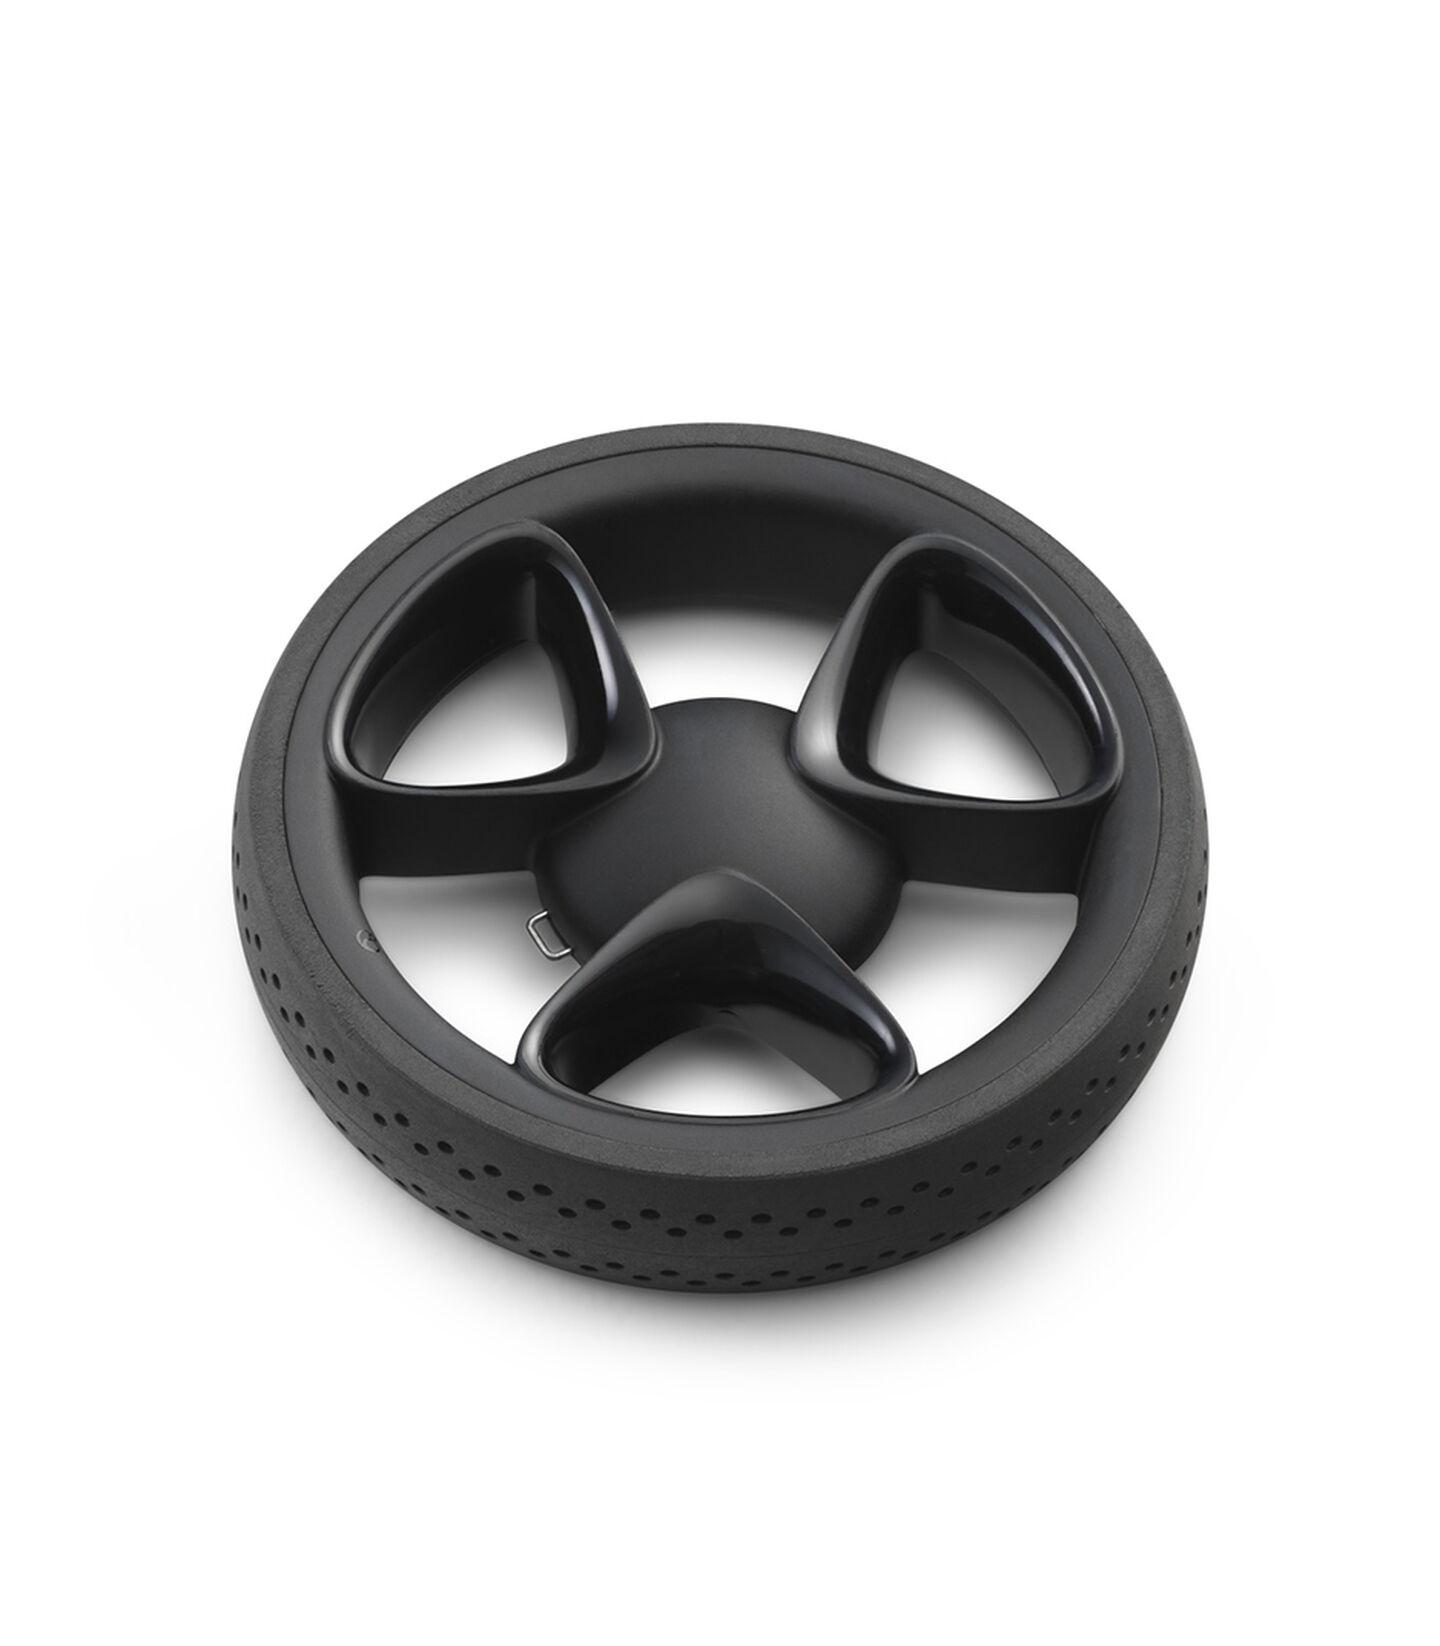 Stokke® Xplory® Back wheel complete Black, Black, mainview view 2